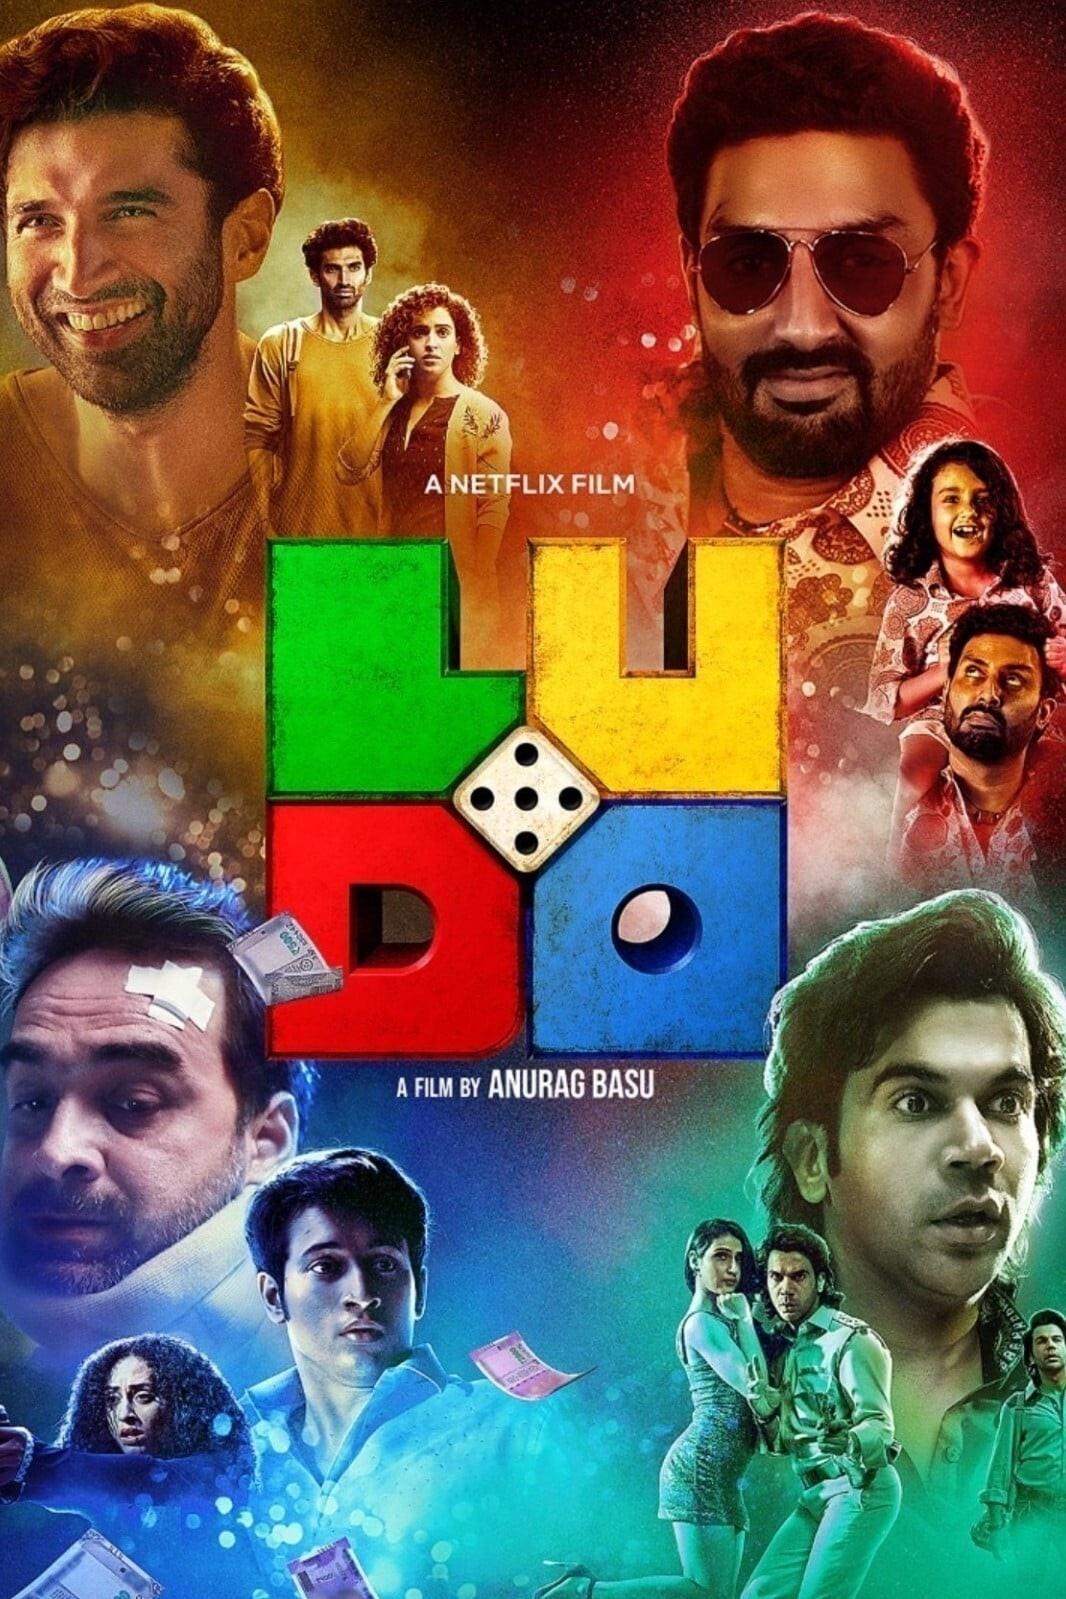 netflix-movie-ludo-review-Indian-cinema-news-online